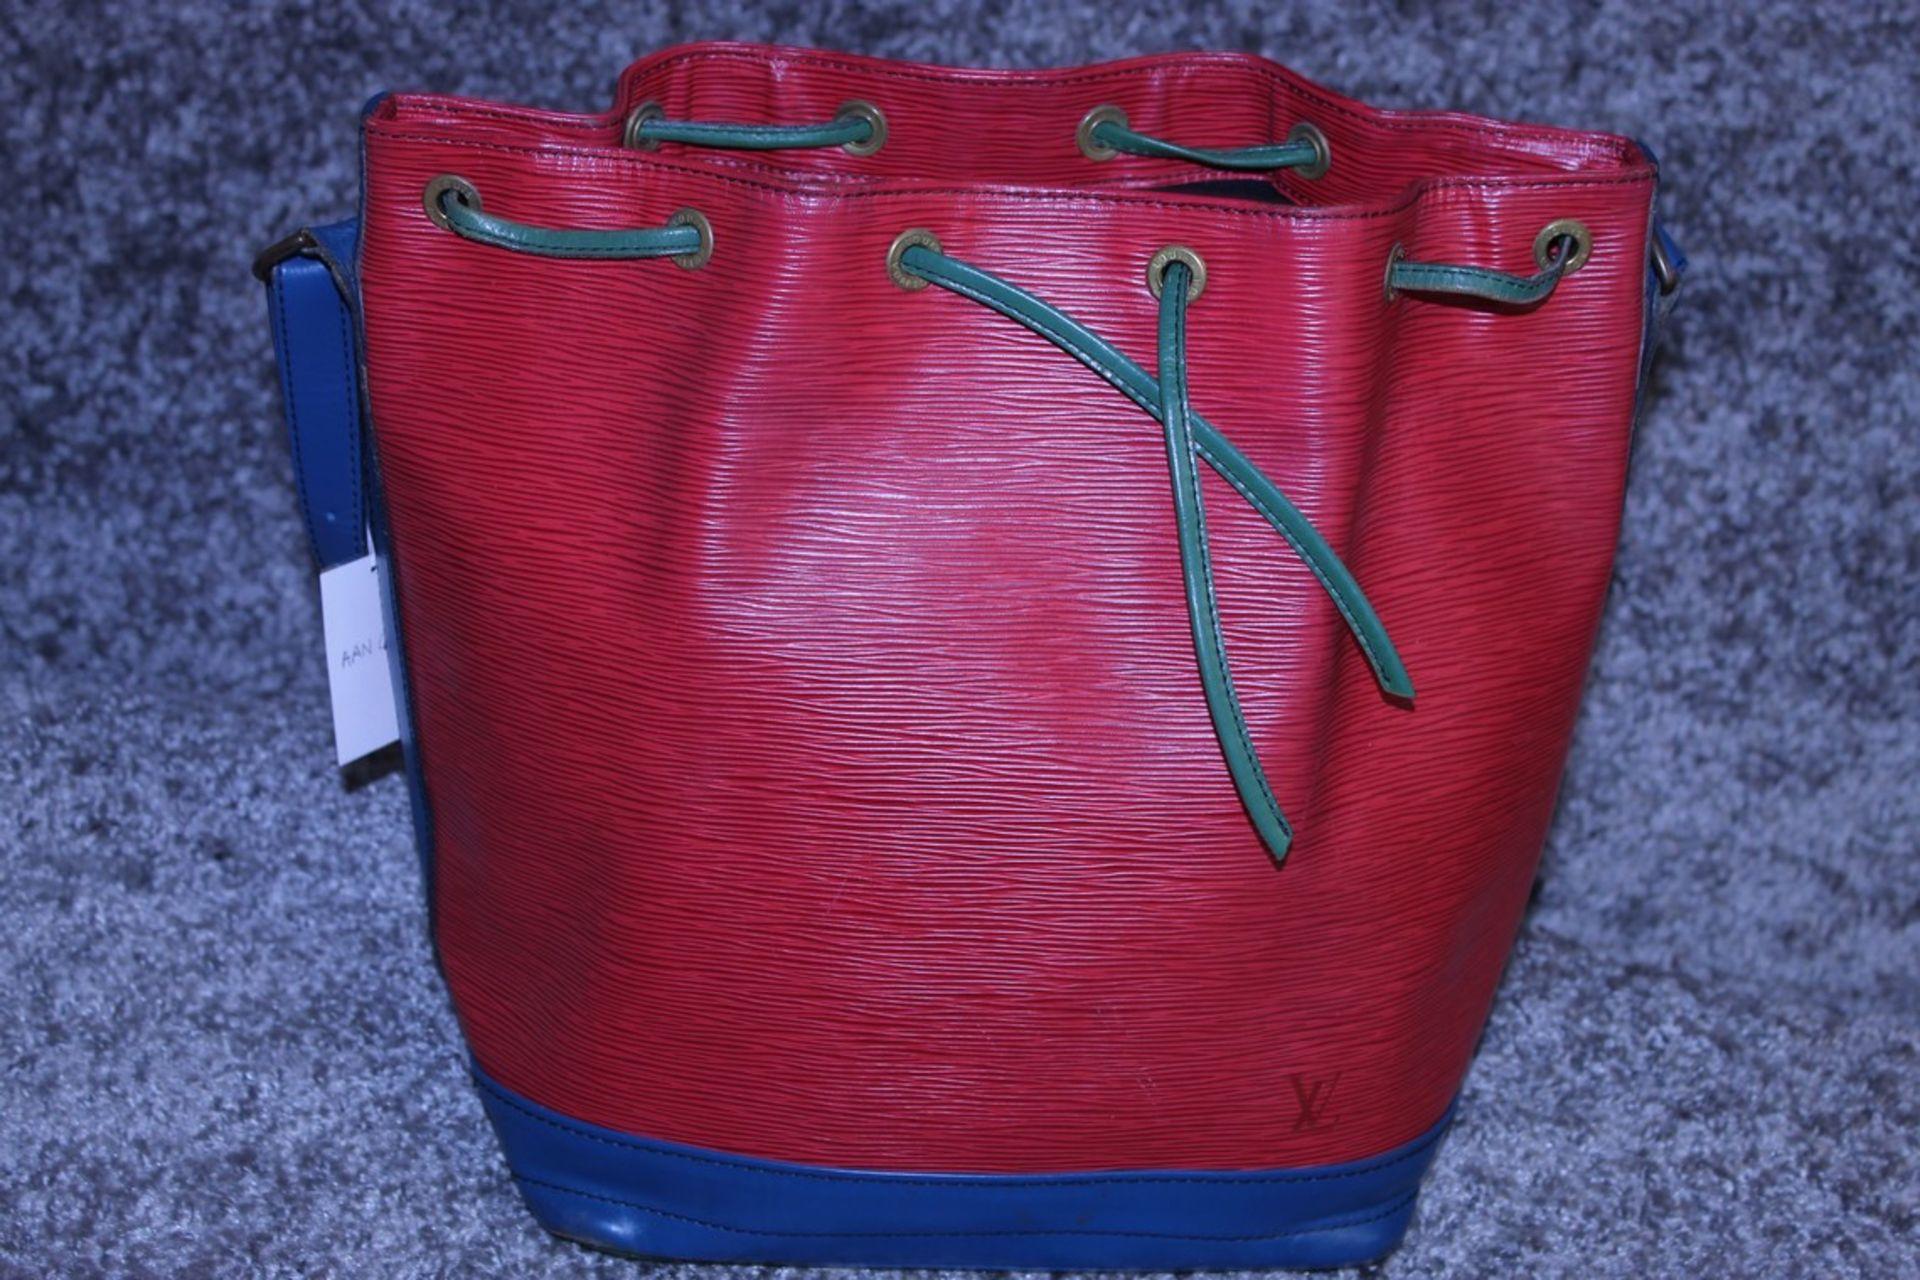 RRP £1,200 Noe Tricolor Shoulder Bag, Red/Blue/Green Epi Claf Leather With Black Stitching - Image 2 of 4